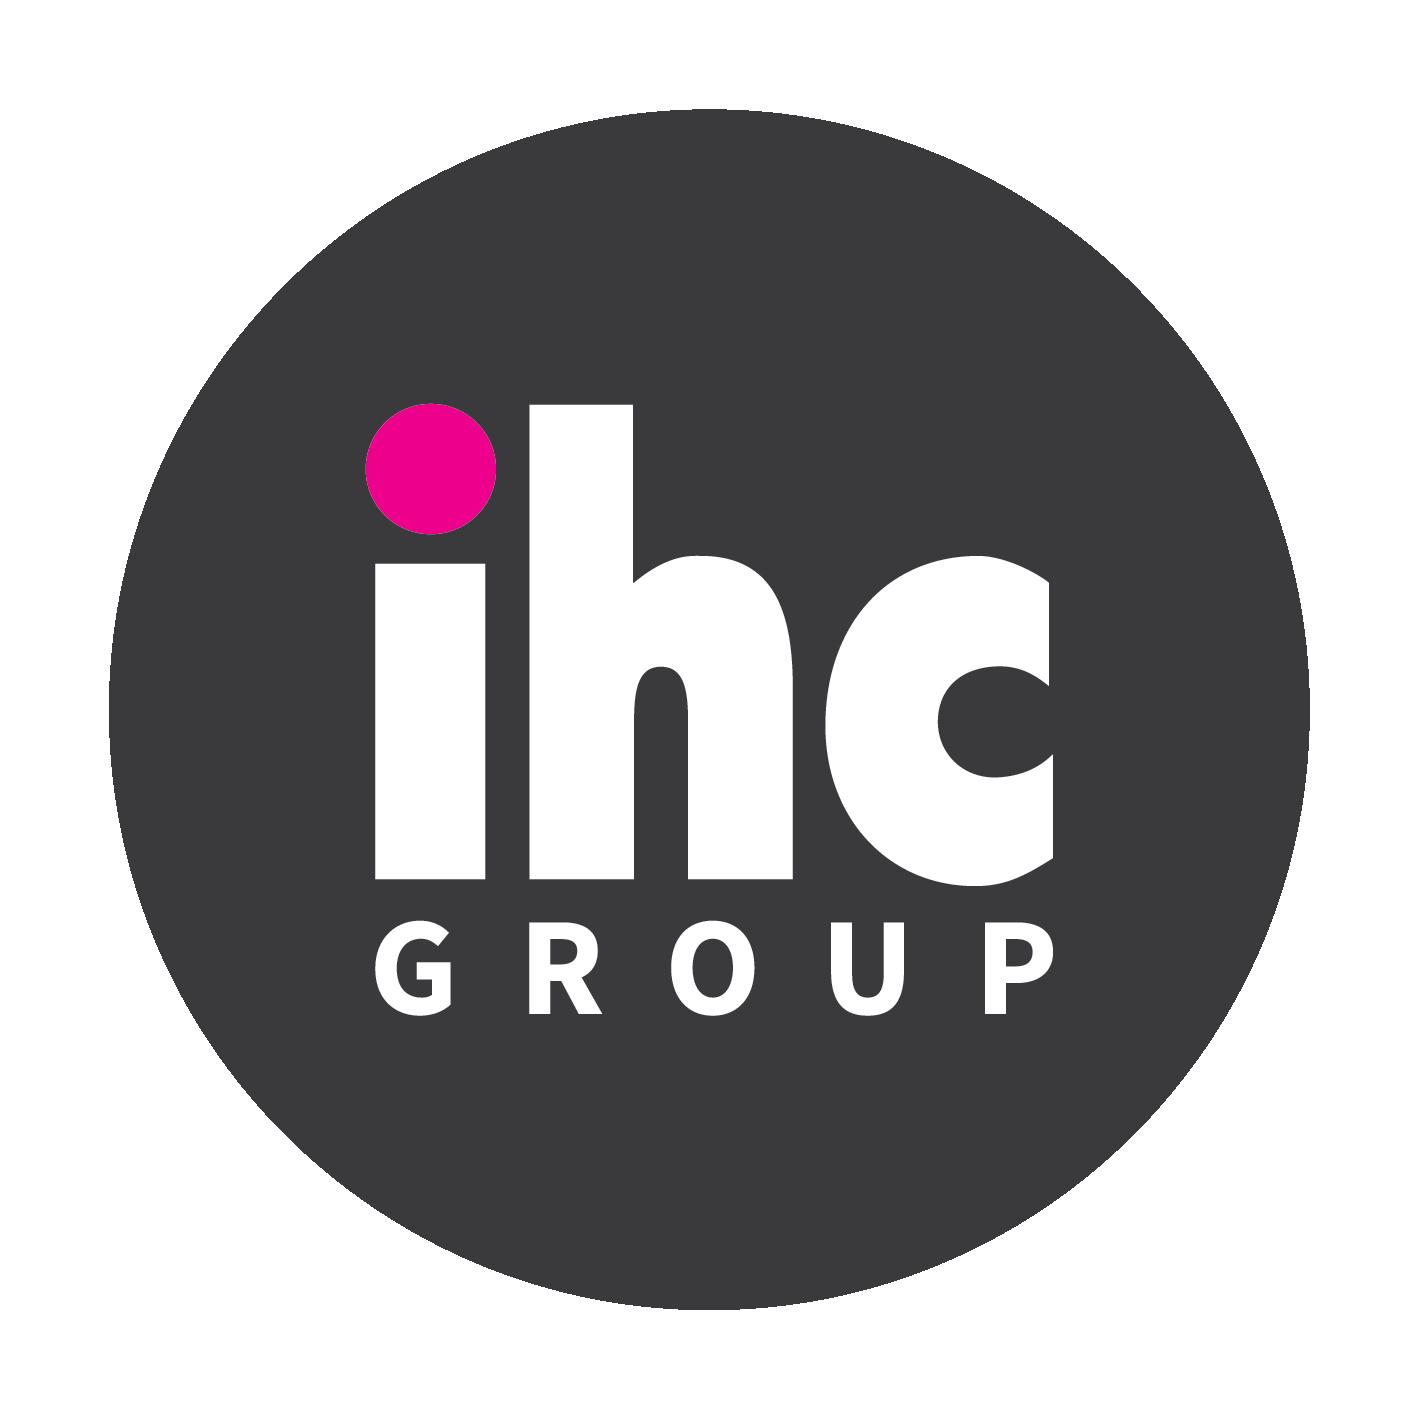 IHC Group